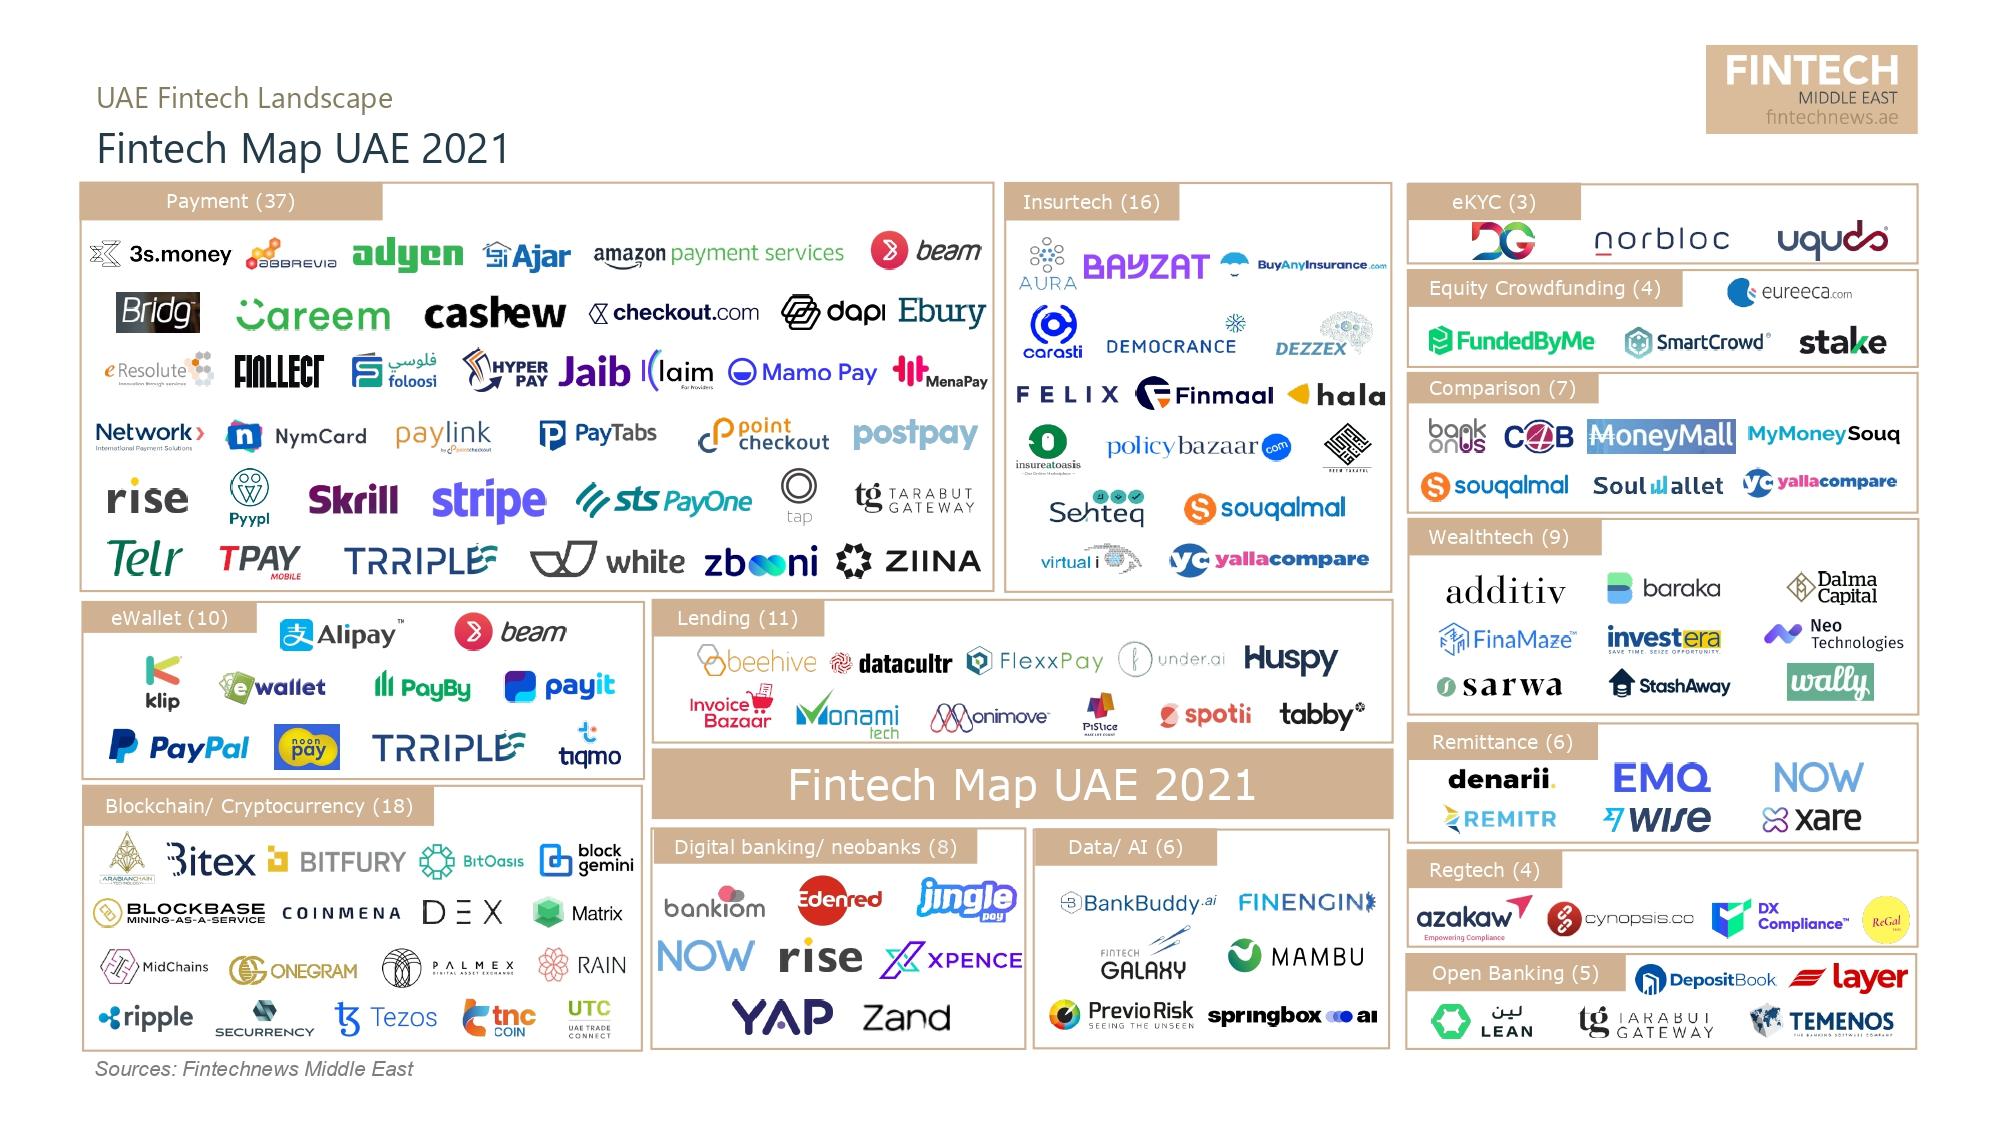 Fintech-Map-UAE-2021-Source-Fintech-News-Middle-East-UAE-Fintech-Report-2021-July-2021